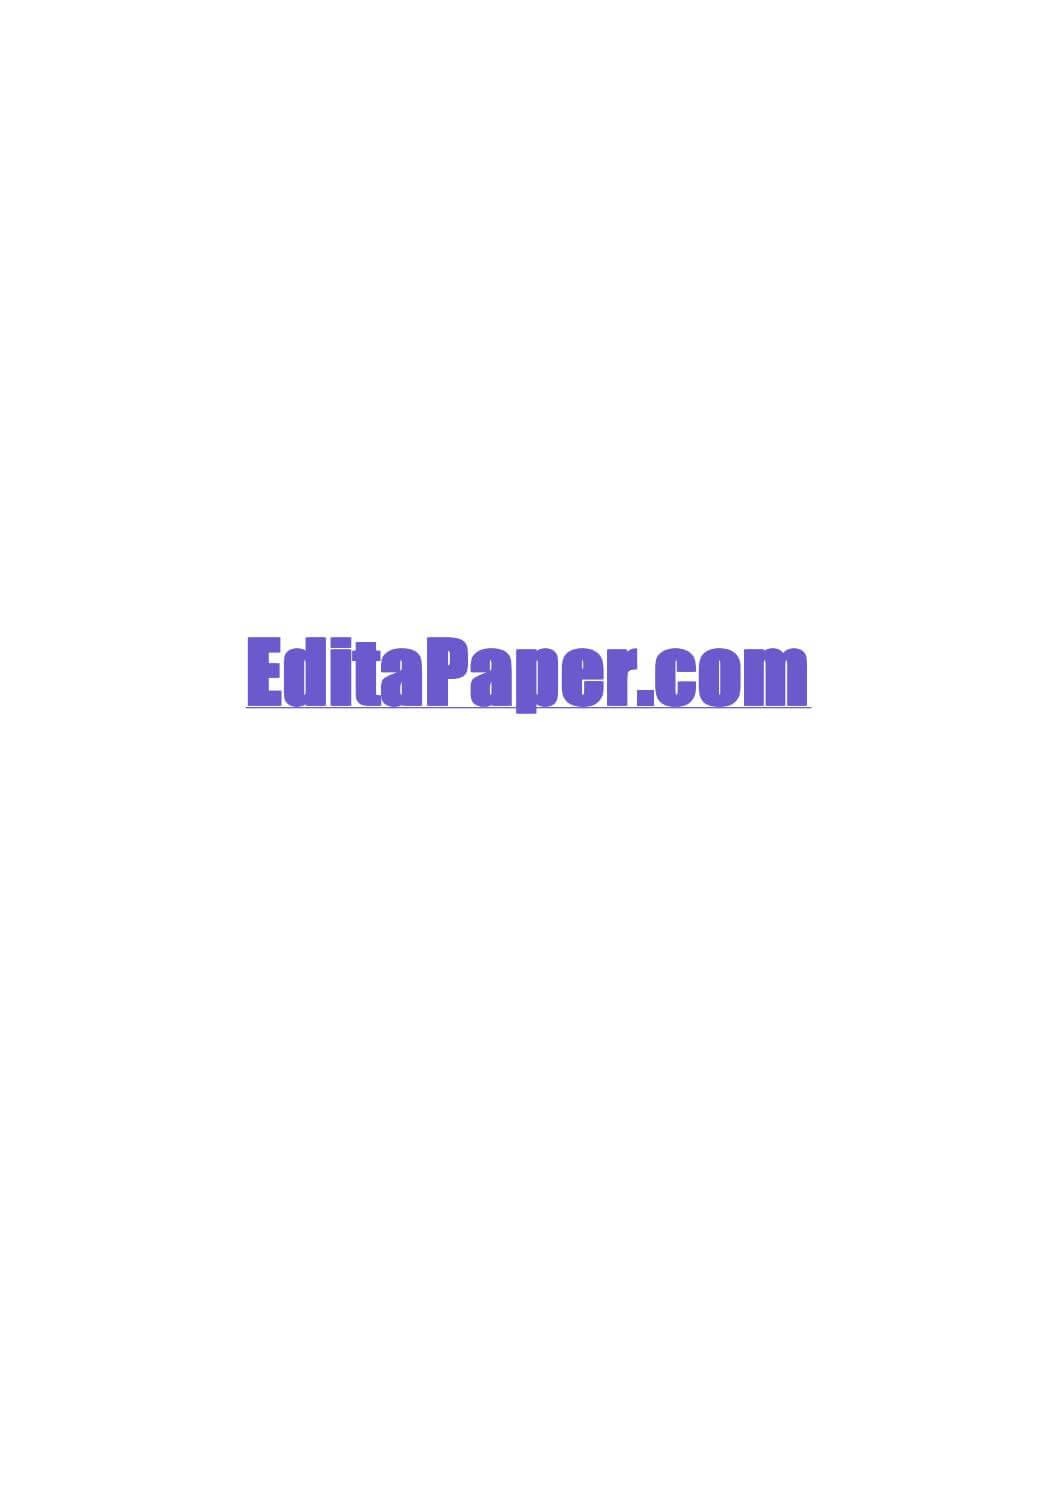 Apa Format Essay Template Word 2010Courtneyixzz – Issuu Regarding Apa Template For Word 2010